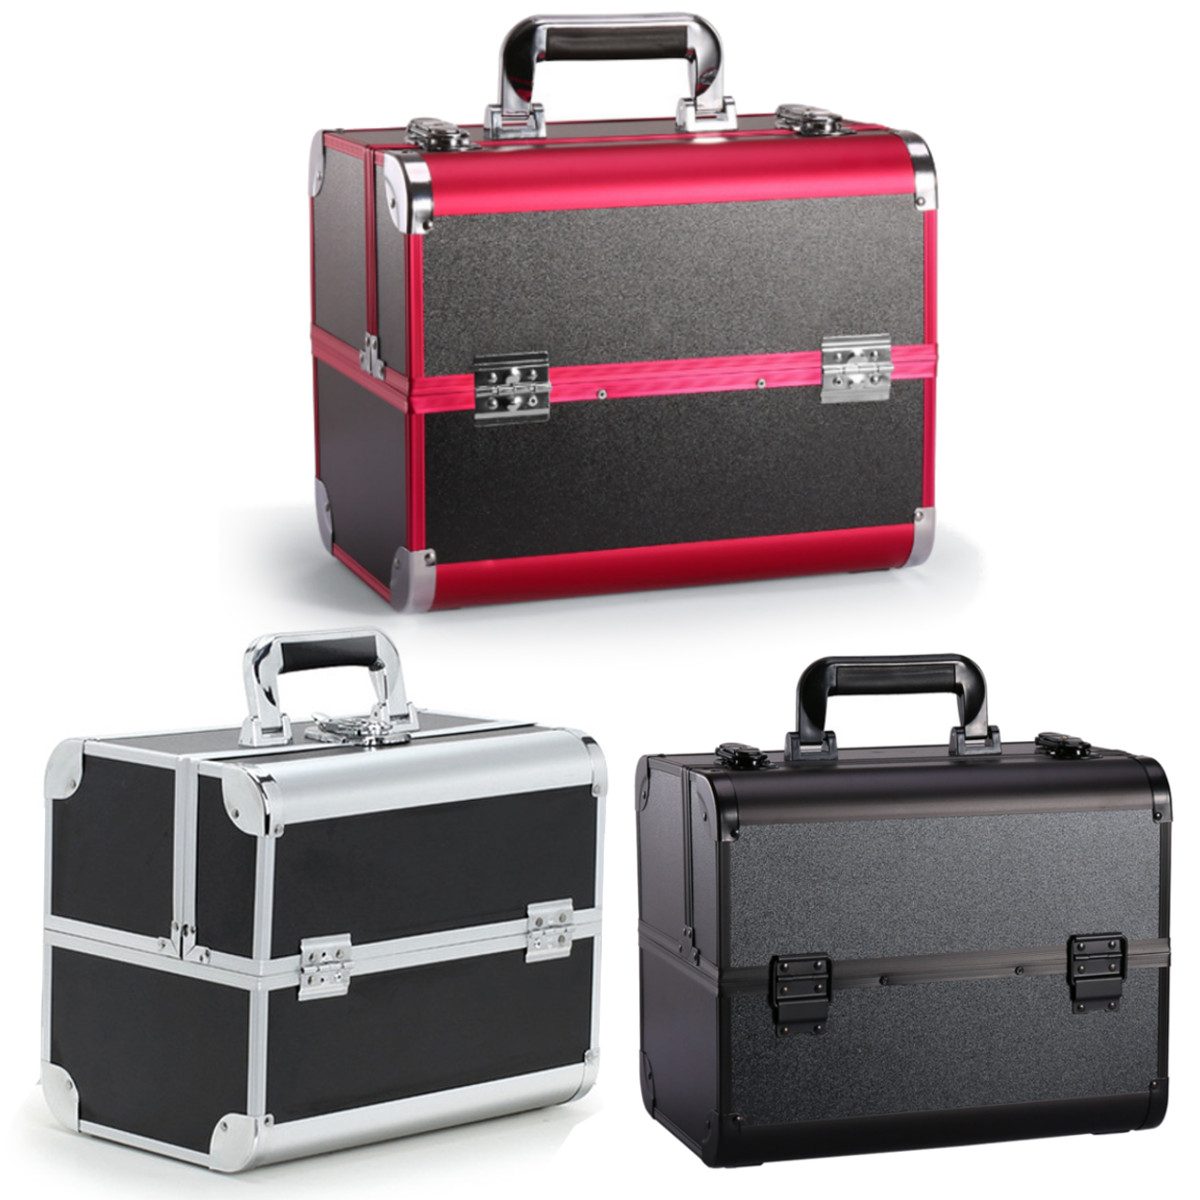 Caja de almacenaje para maquillaje de aluminio grande, organizador de cosméticos portátil, caja de joyería, organizador para mujer, cosméticos, cajas de maquillaje, bolsa, Maleta